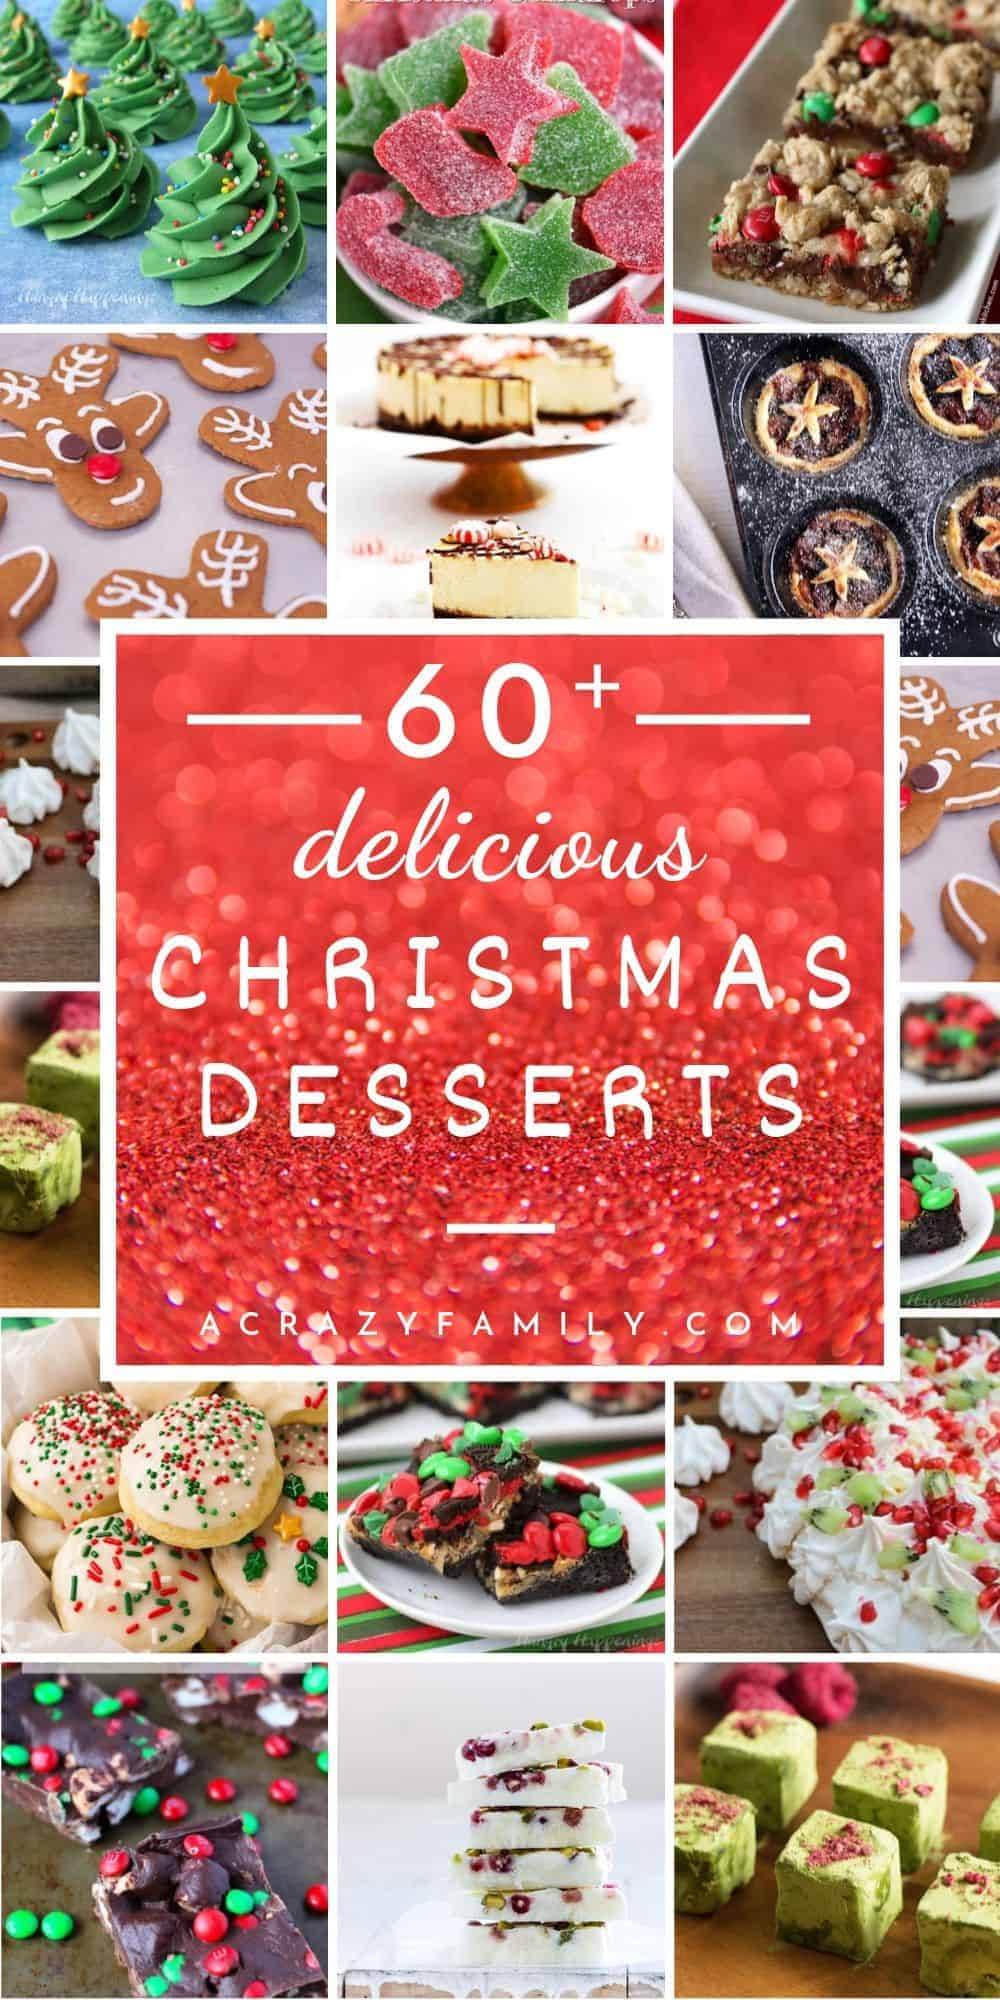 60+ Festive Christmas Desserts